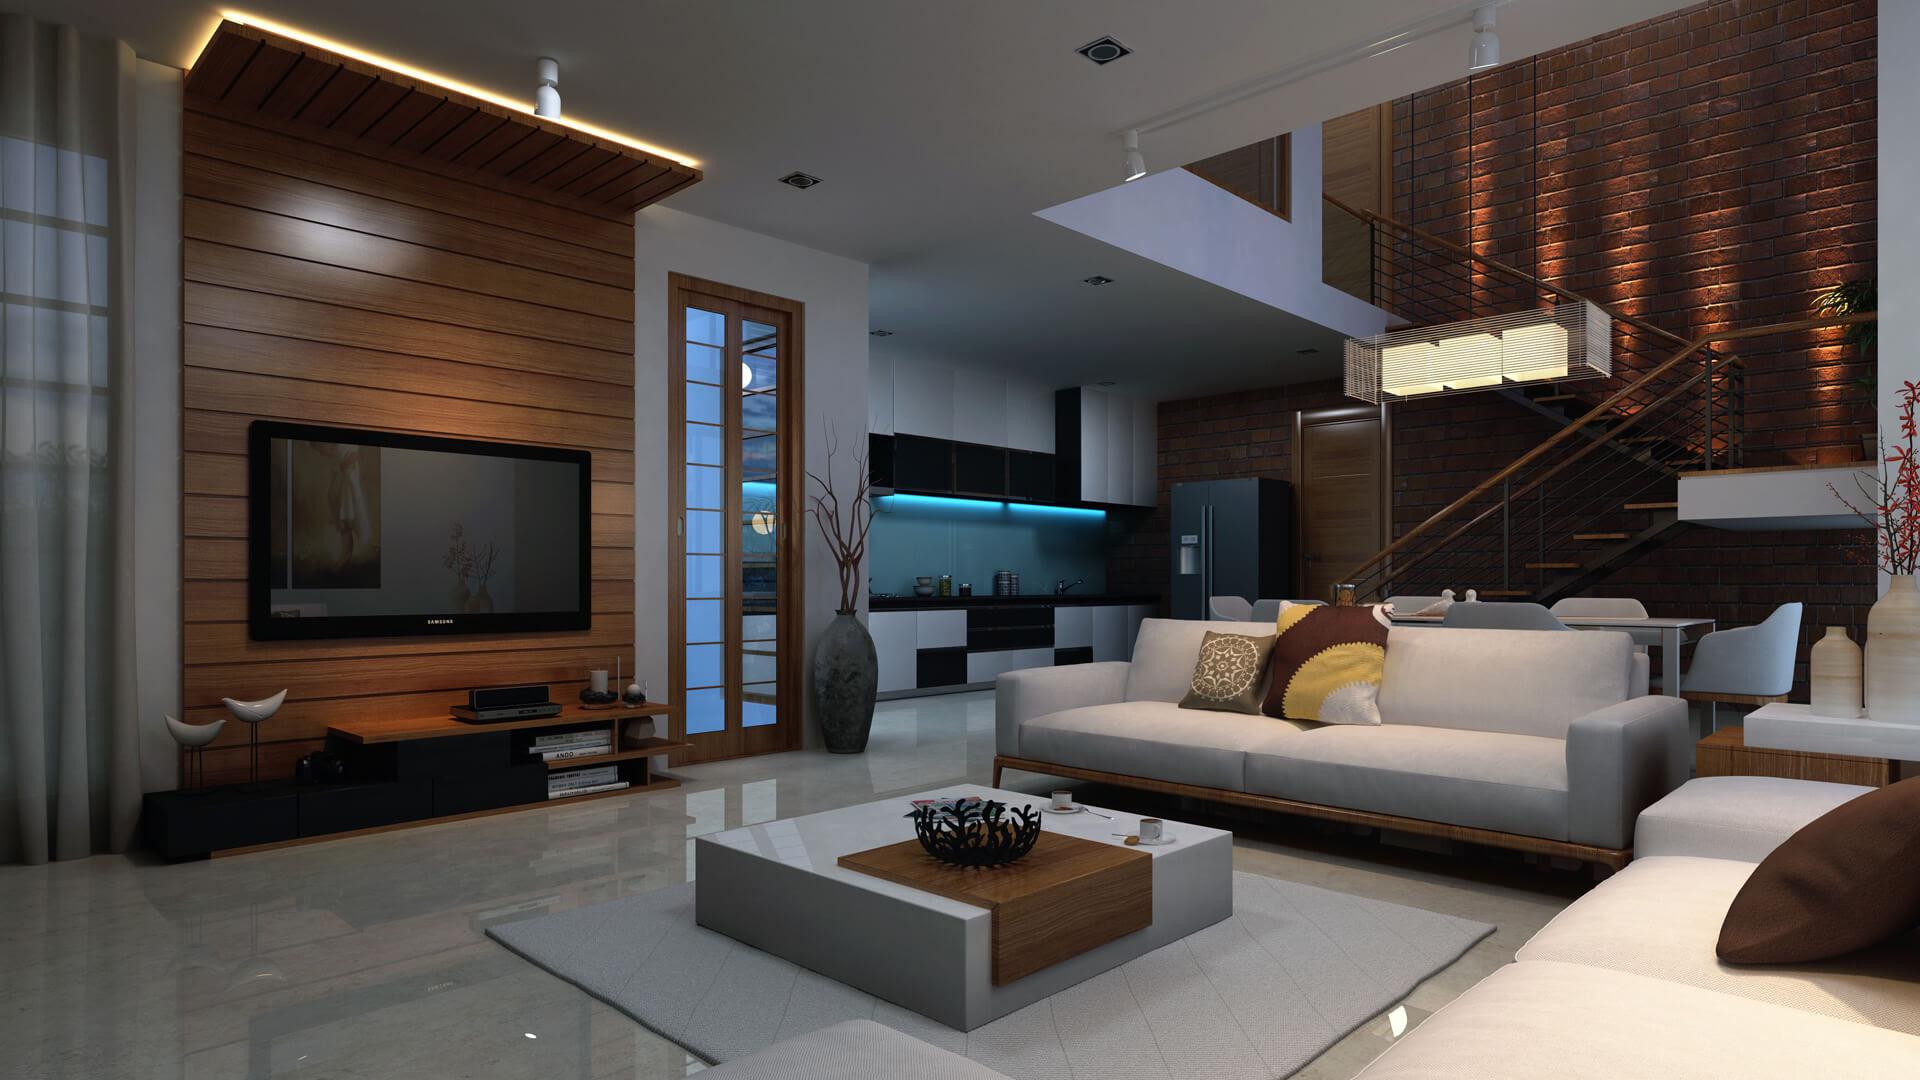 3d Home Bedroom Interior Design